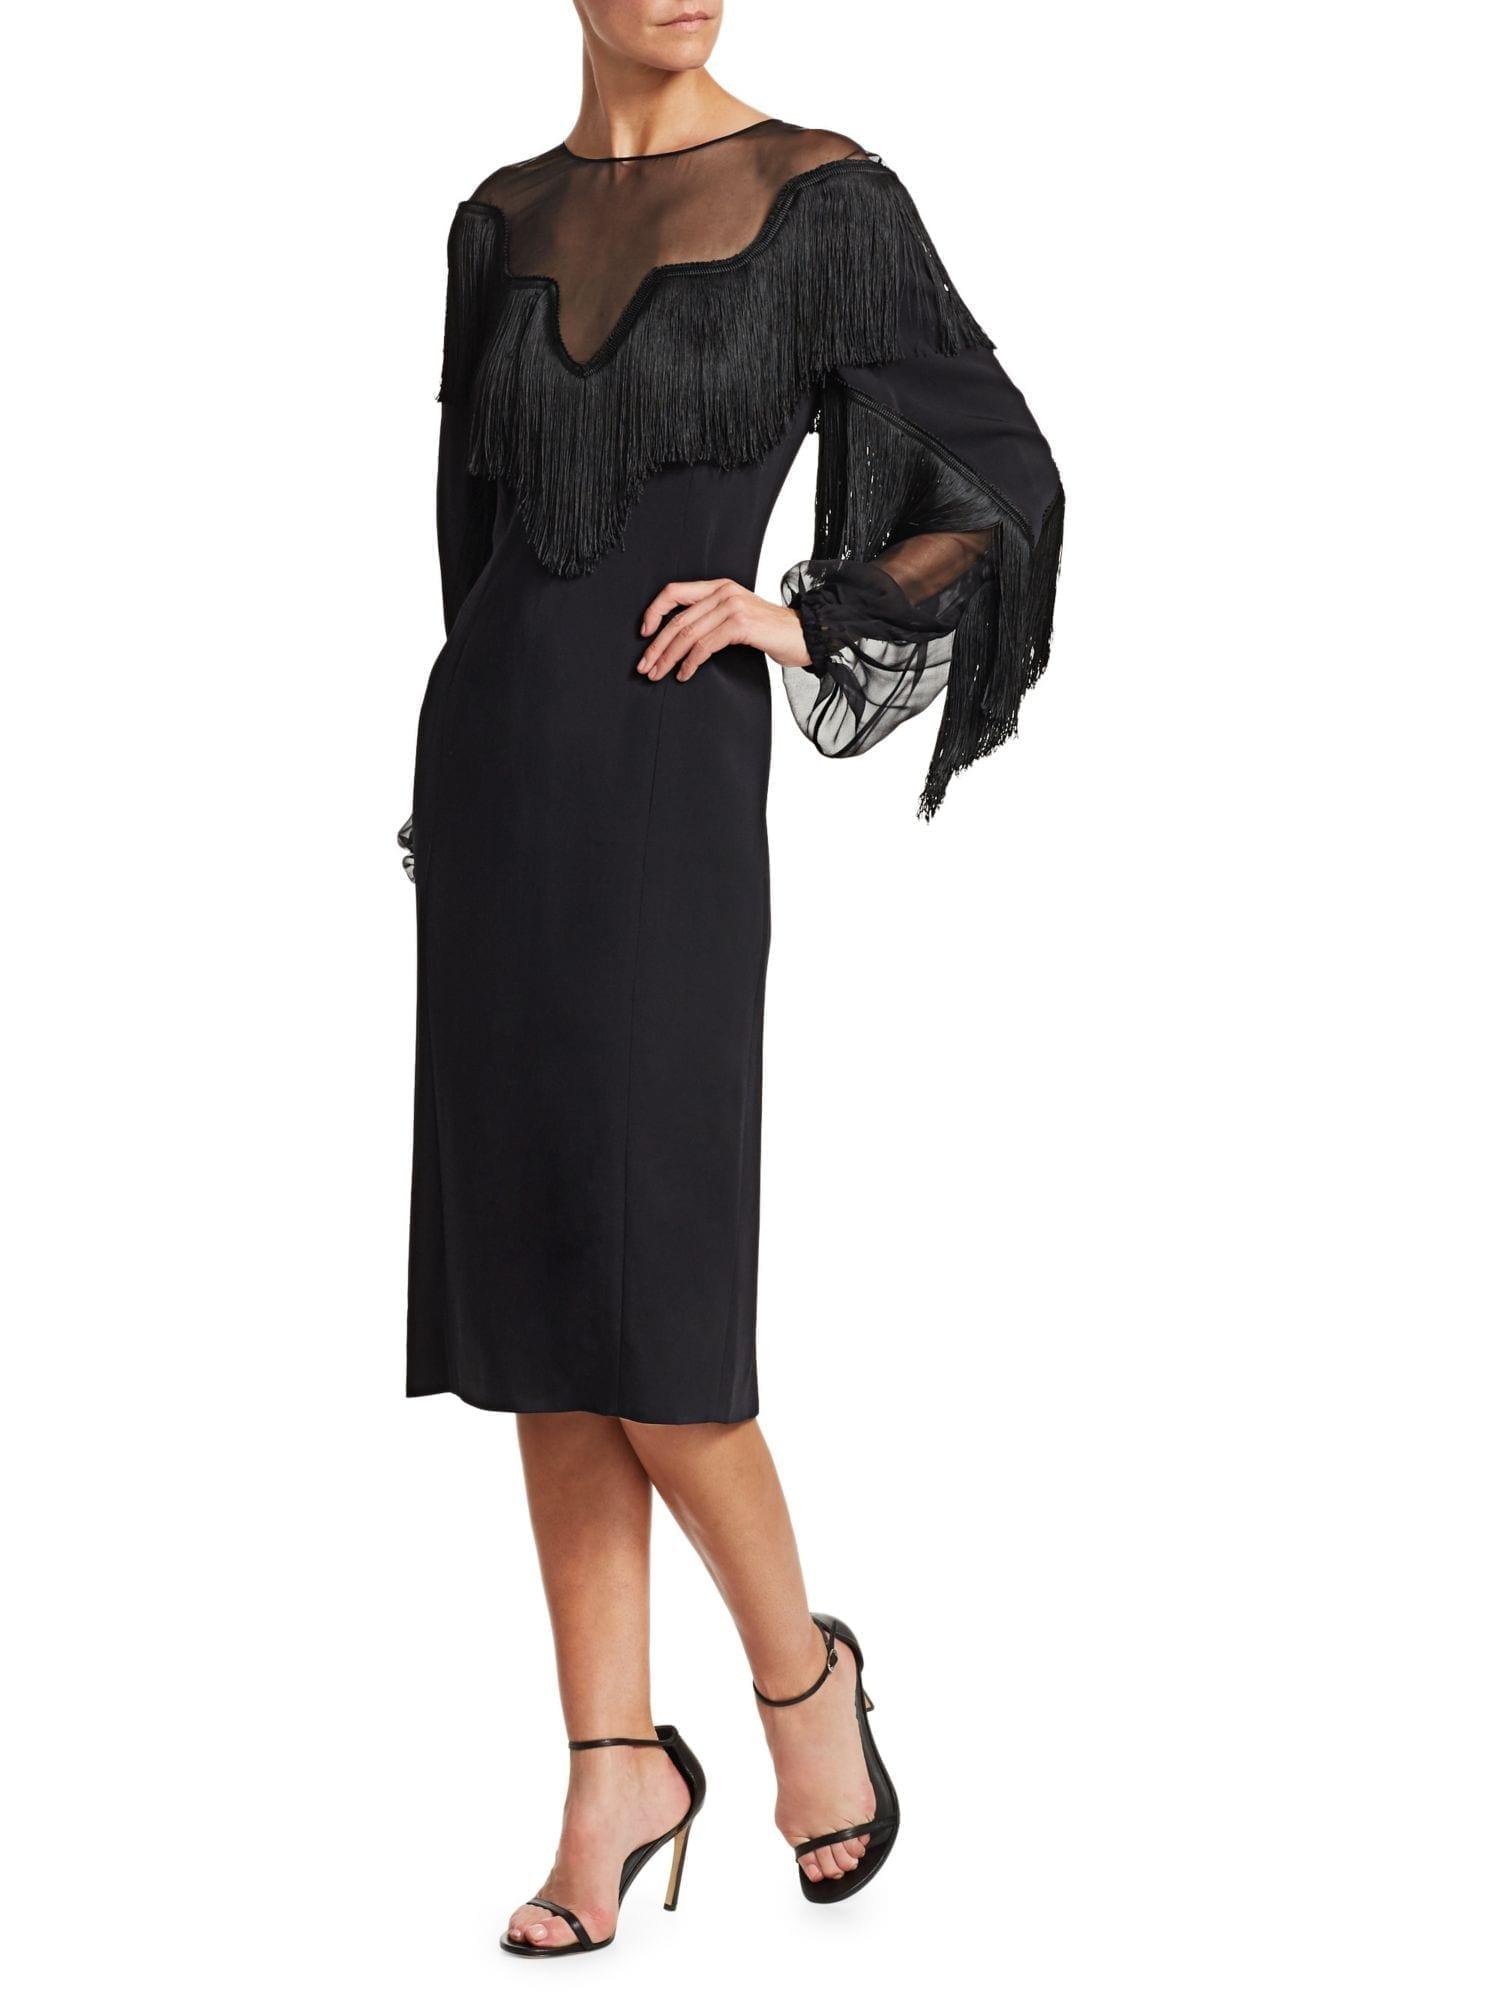 60379fc2e39 ALBERTA FERRETTI Long Sleeve Fringe Black Dress - We Select Dresses